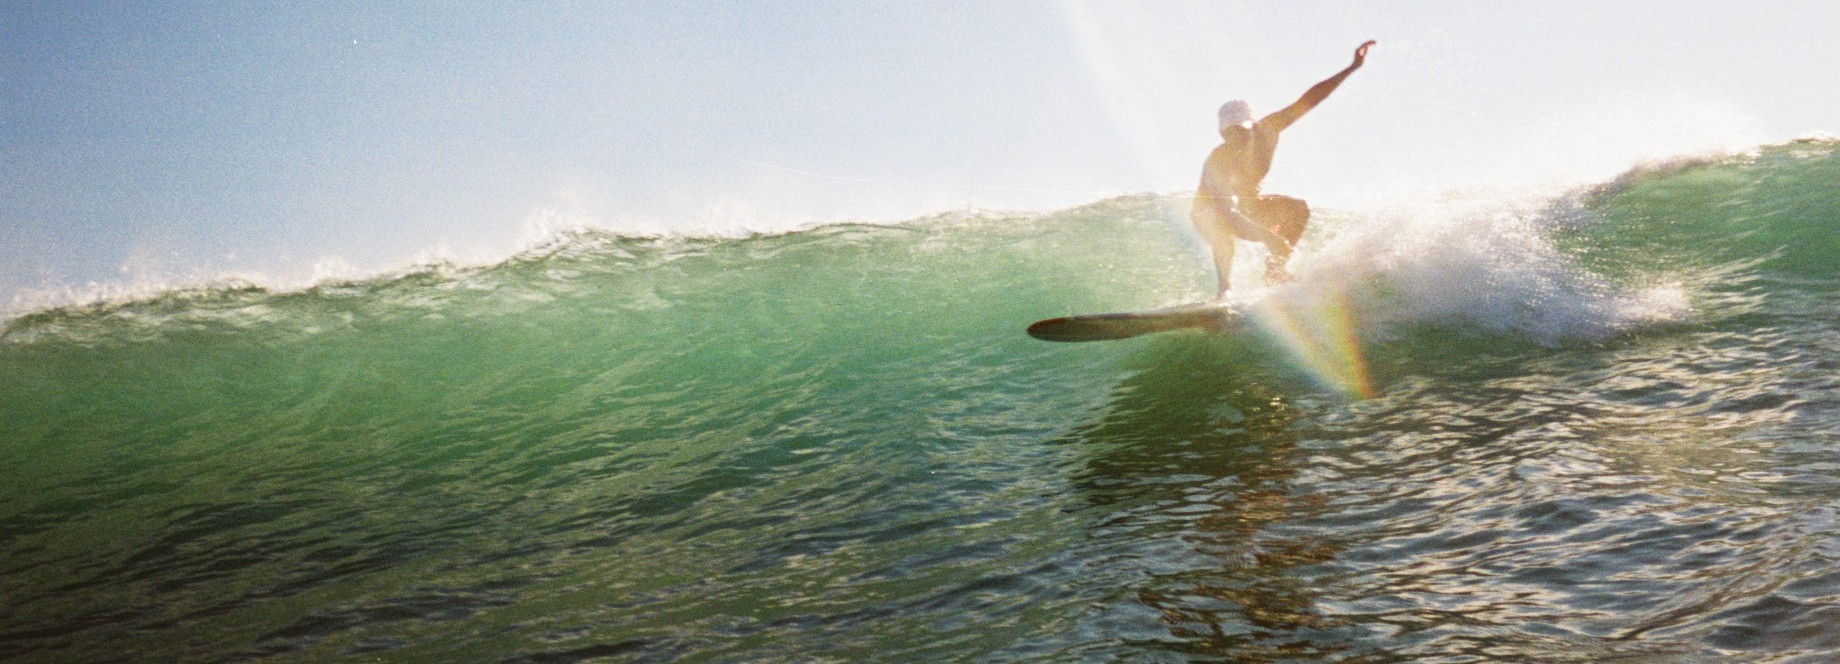 sayulita-surfing